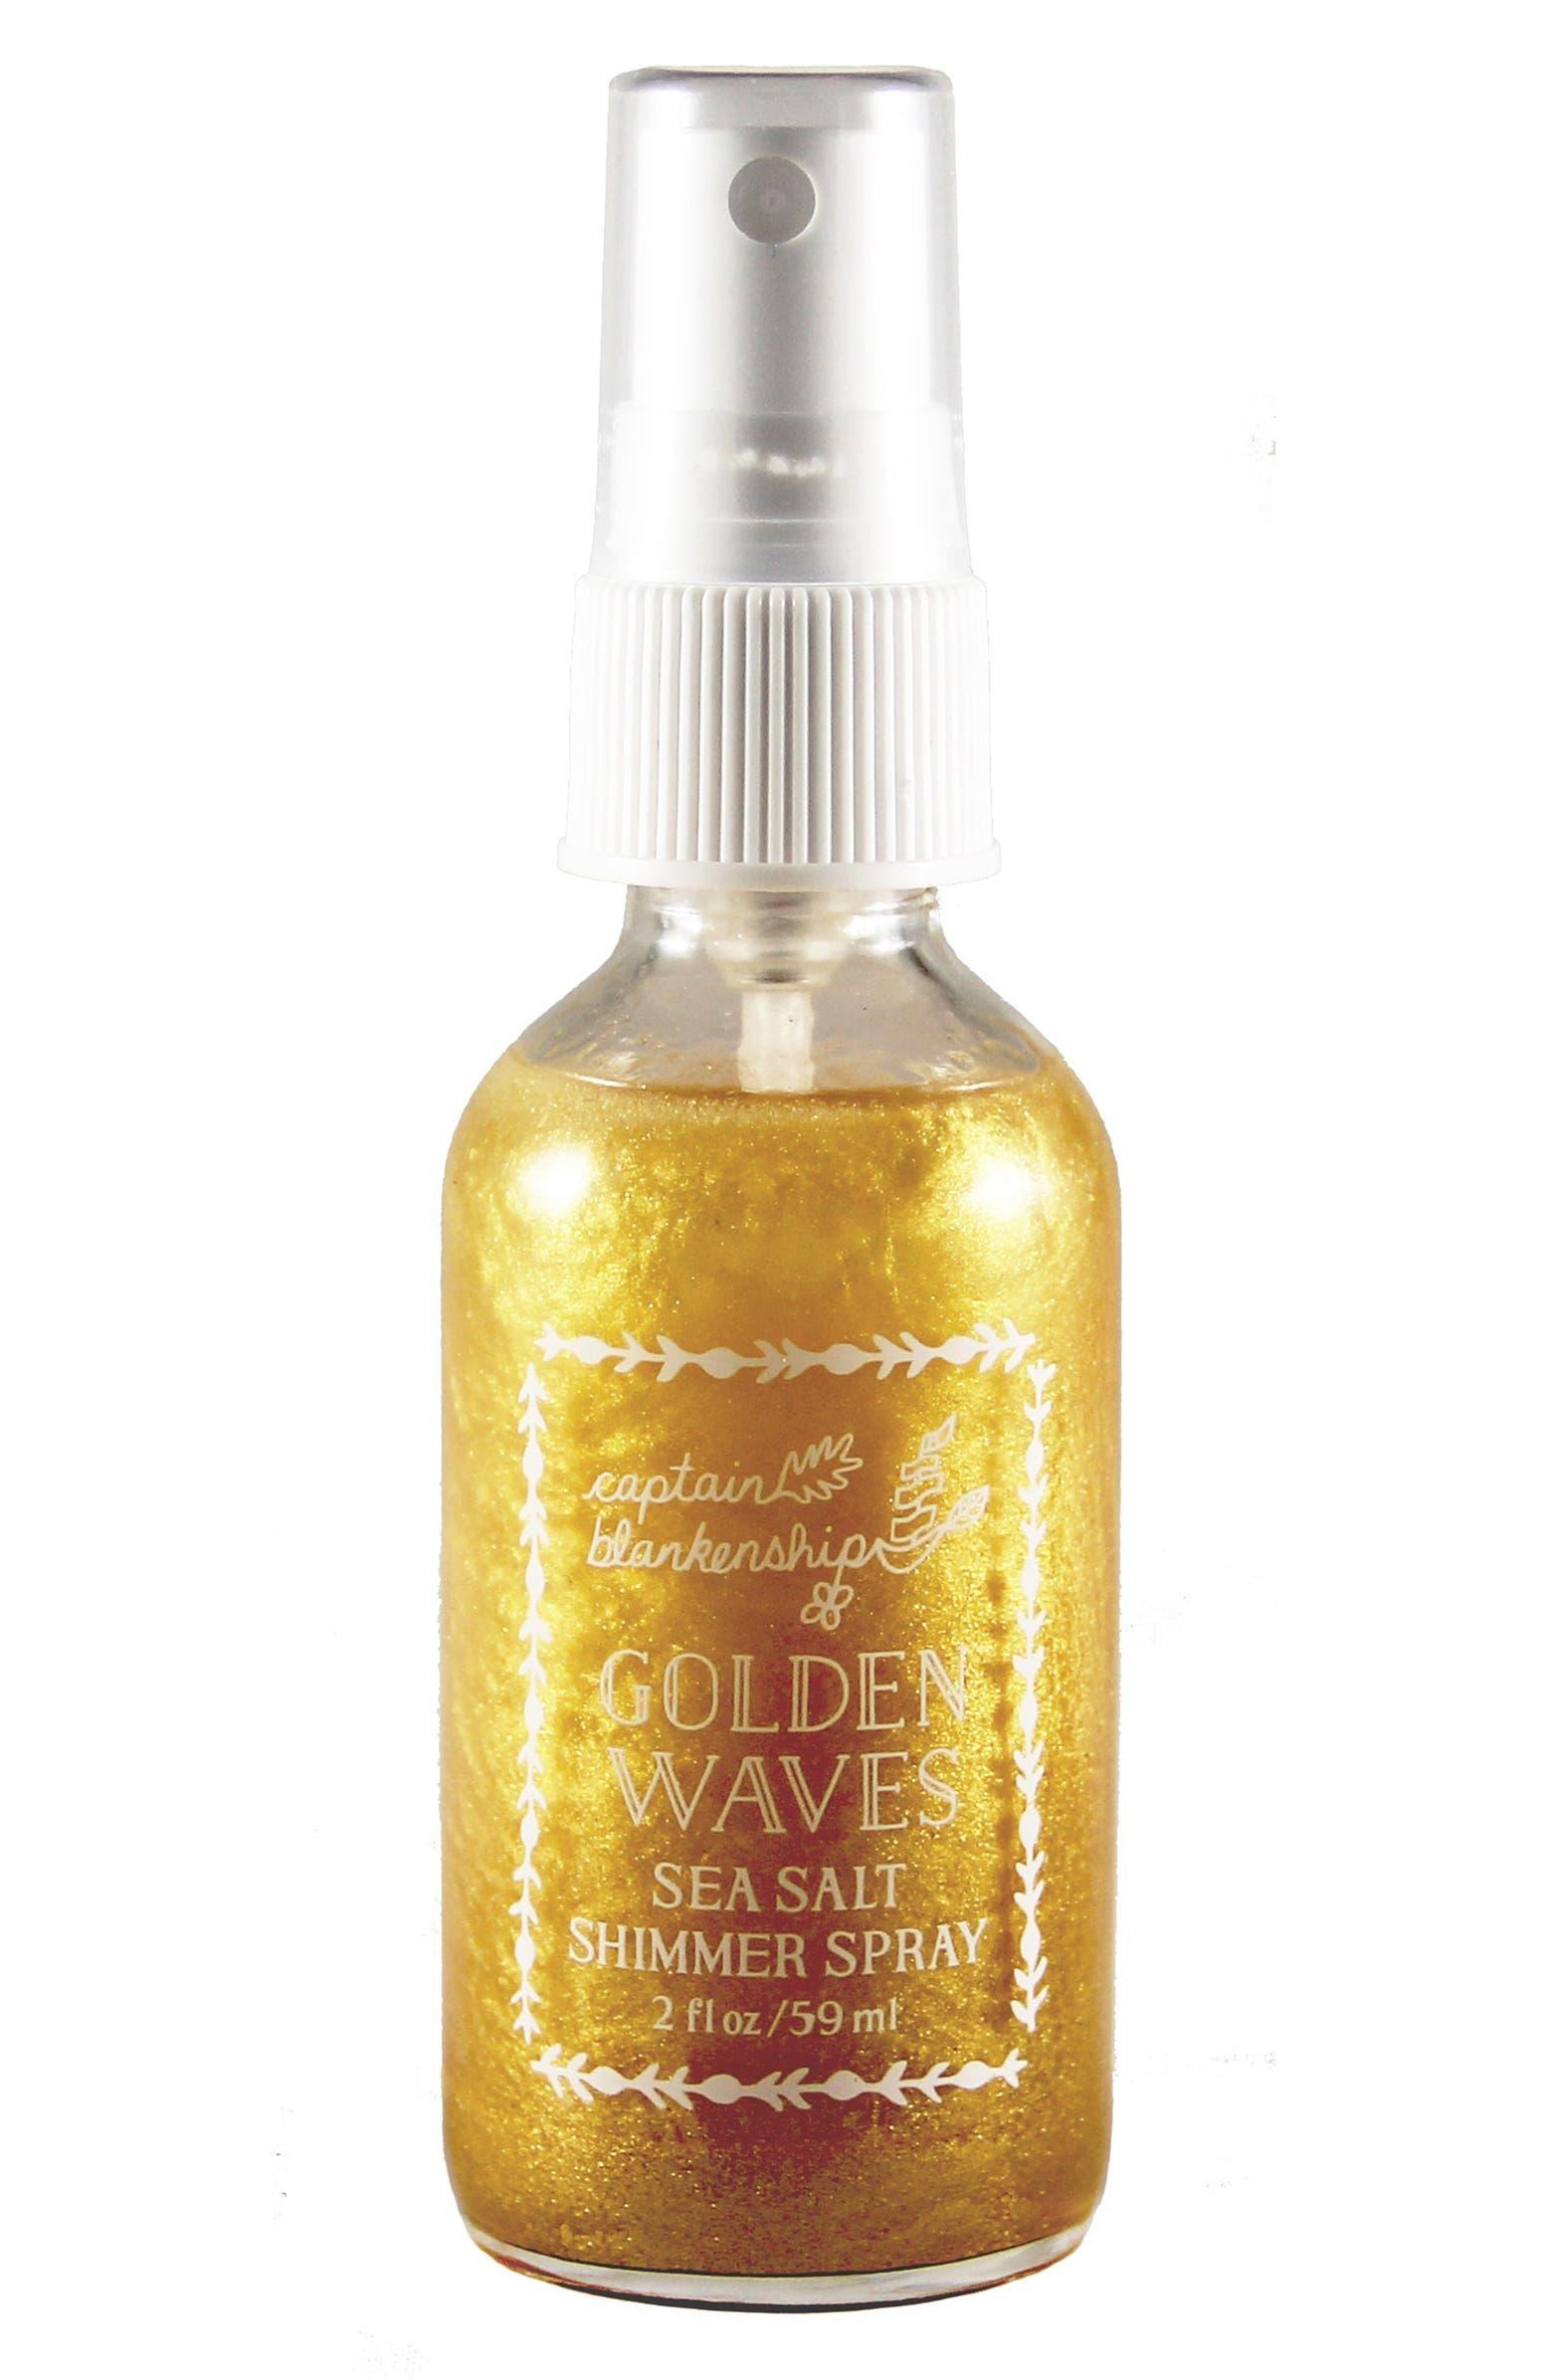 Golden Waves Sea Salt Shimmer Spray CAPTAIN BLANKENSHIP